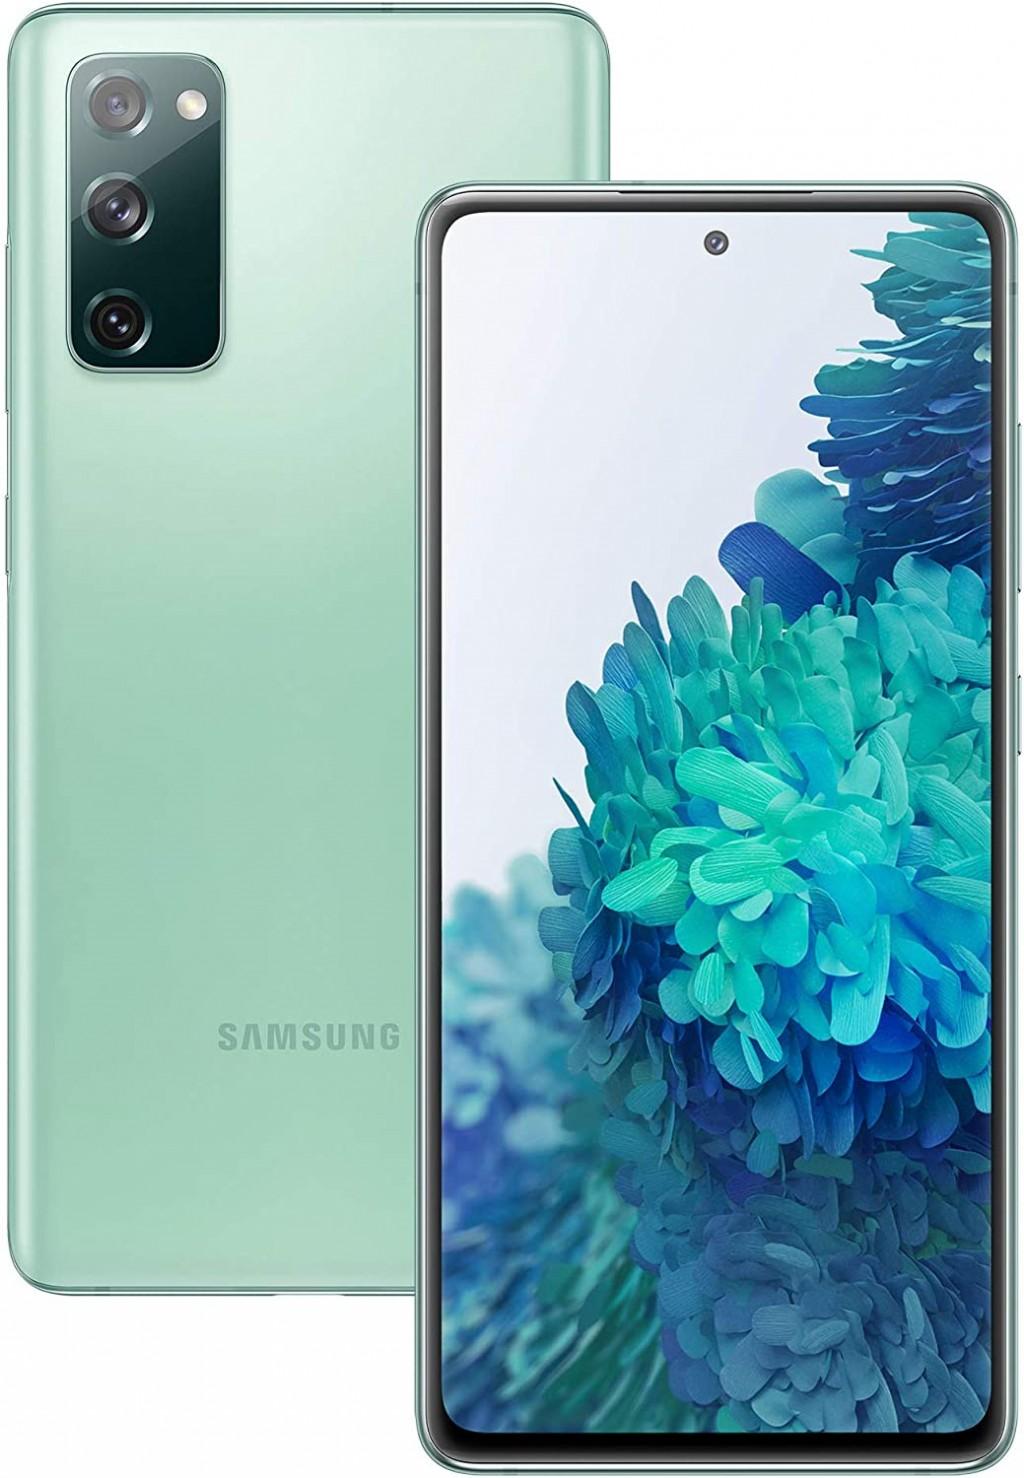 "Samsung Galaxy S20 FE Mint, 6.5 "", Super AMOLED, 1080 x 2400, Exynos 990, Internal RAM 6 GB, 128 GB, microSD, Dual SIM, Nano-SIM, 3G, 4G, Main camera 12 + 12 + 8 MP, Secondary camera 32 MP, Android, 10, 4500 mAh"